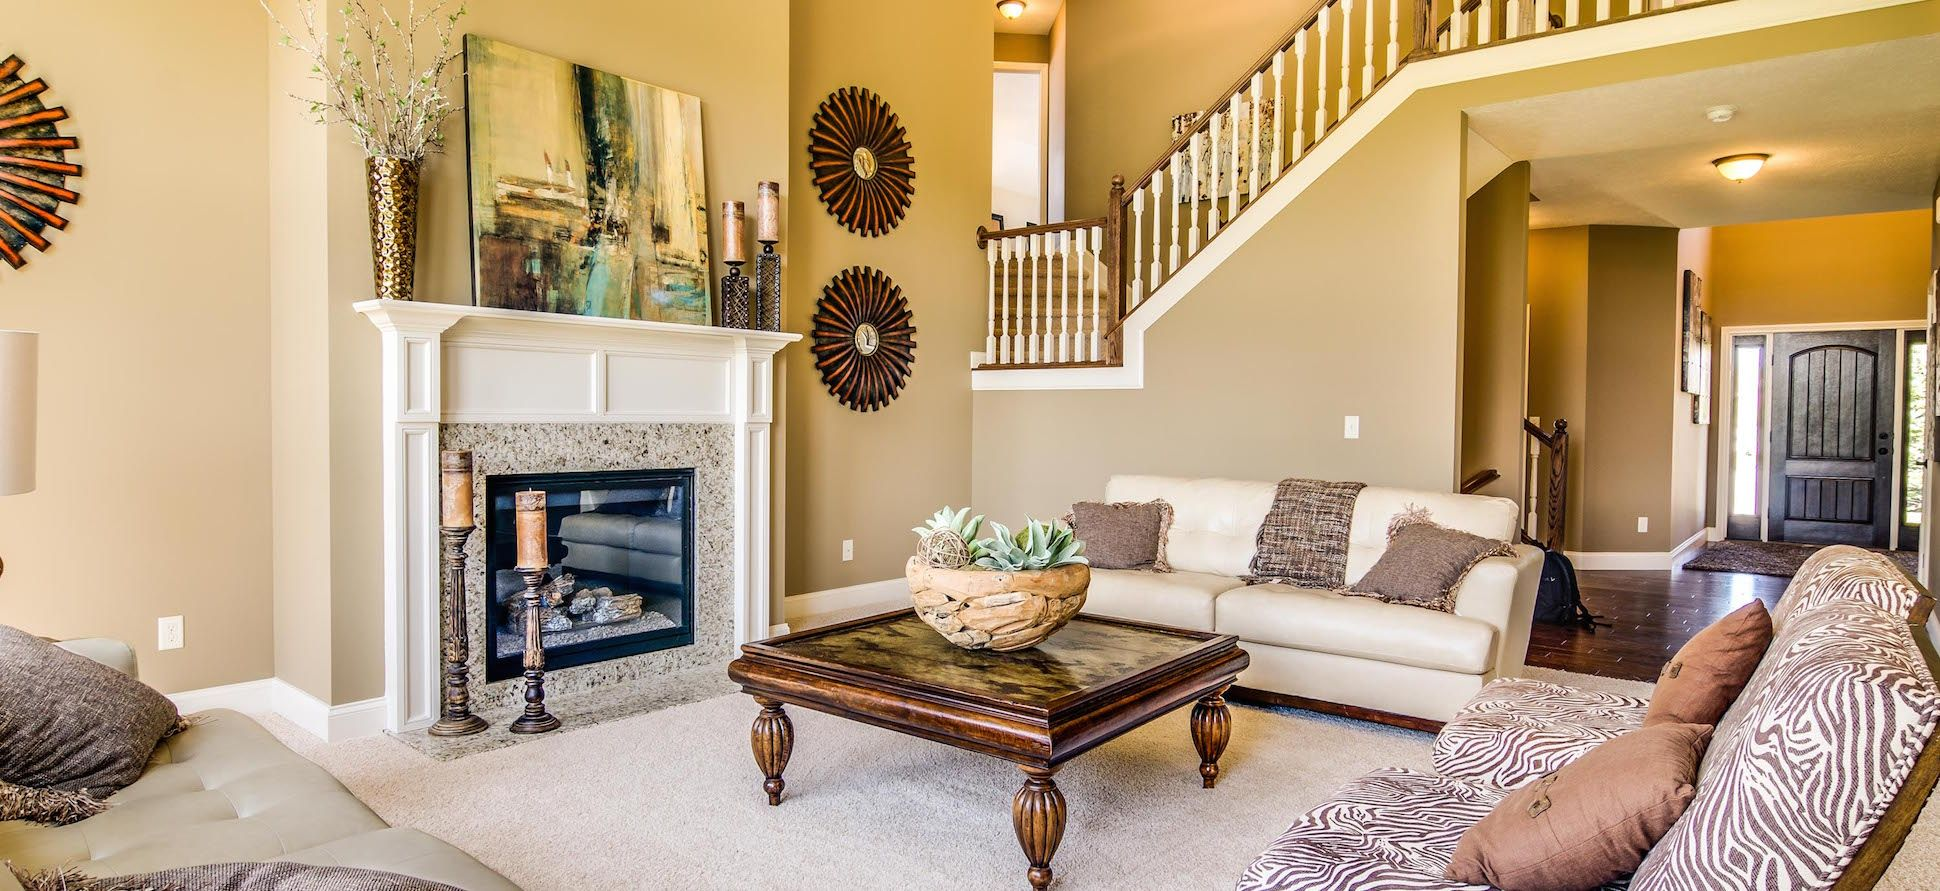 savannah ii home design plan ohio multi level floor homes for sale - Trinity Home Design